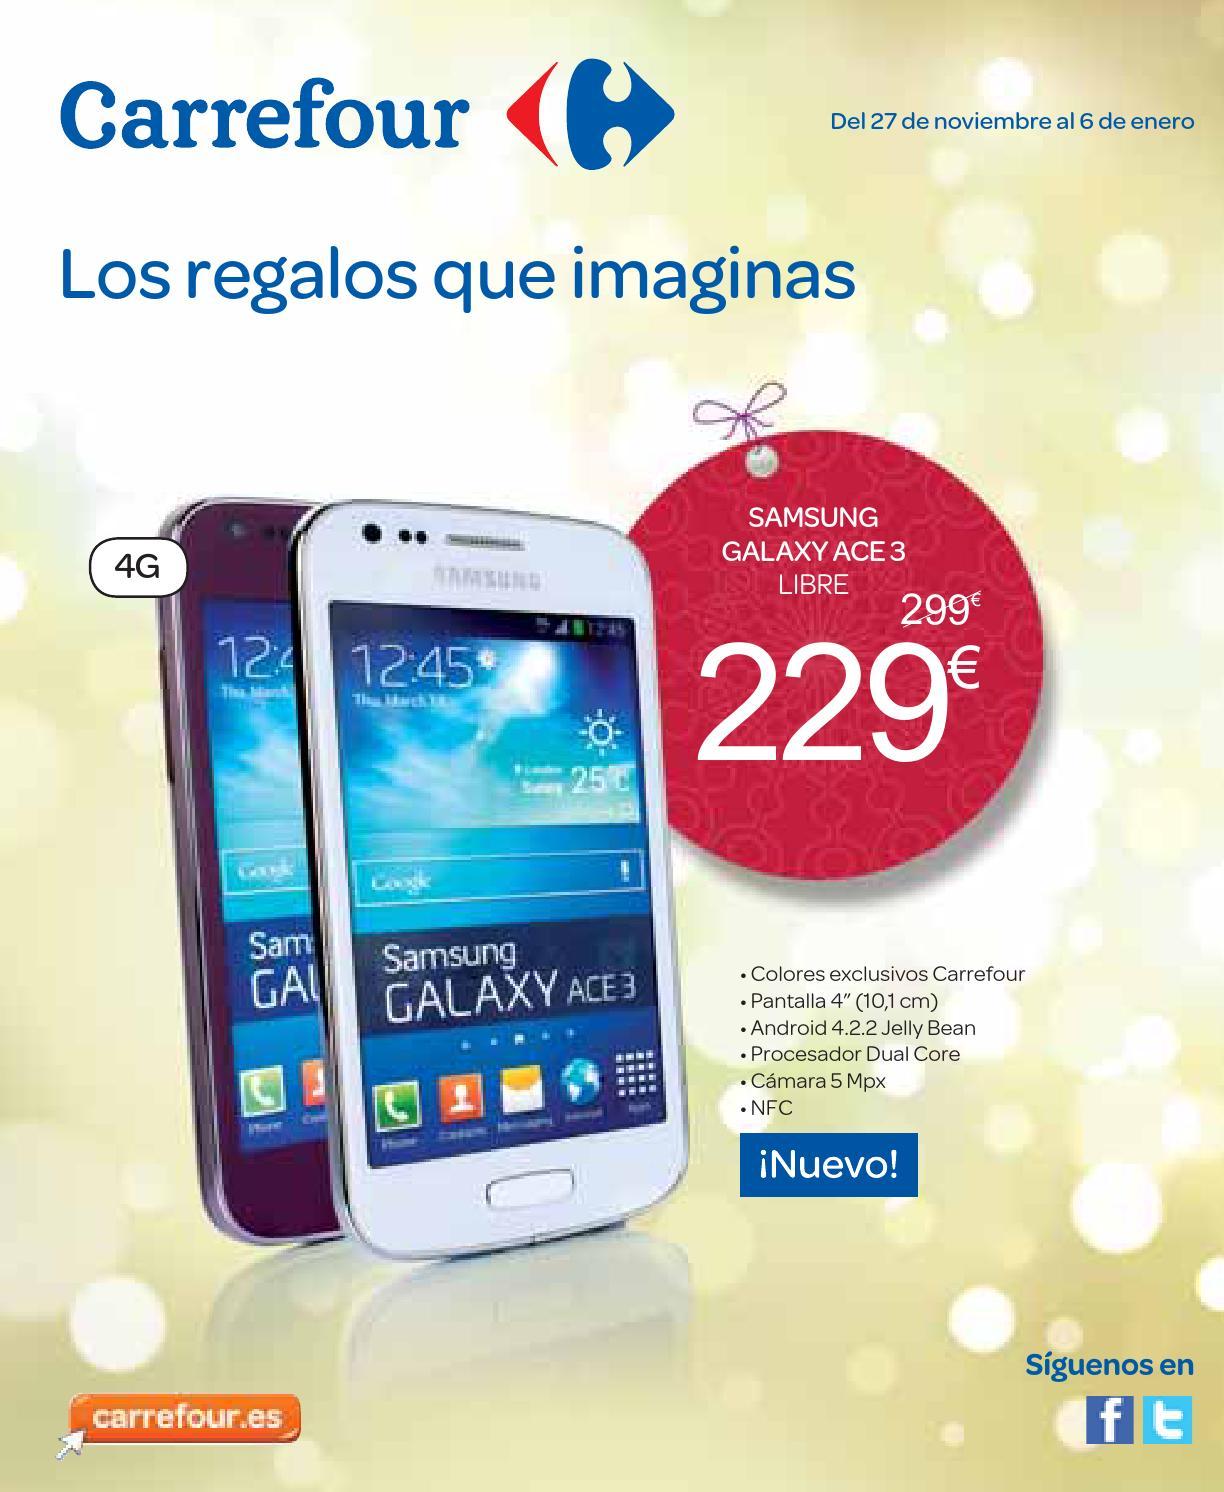 Catalogo Carrefour Ideas Originales Navidad By Carrefour Online  ~ Pinzas Sujeta Sabanas Carrefour